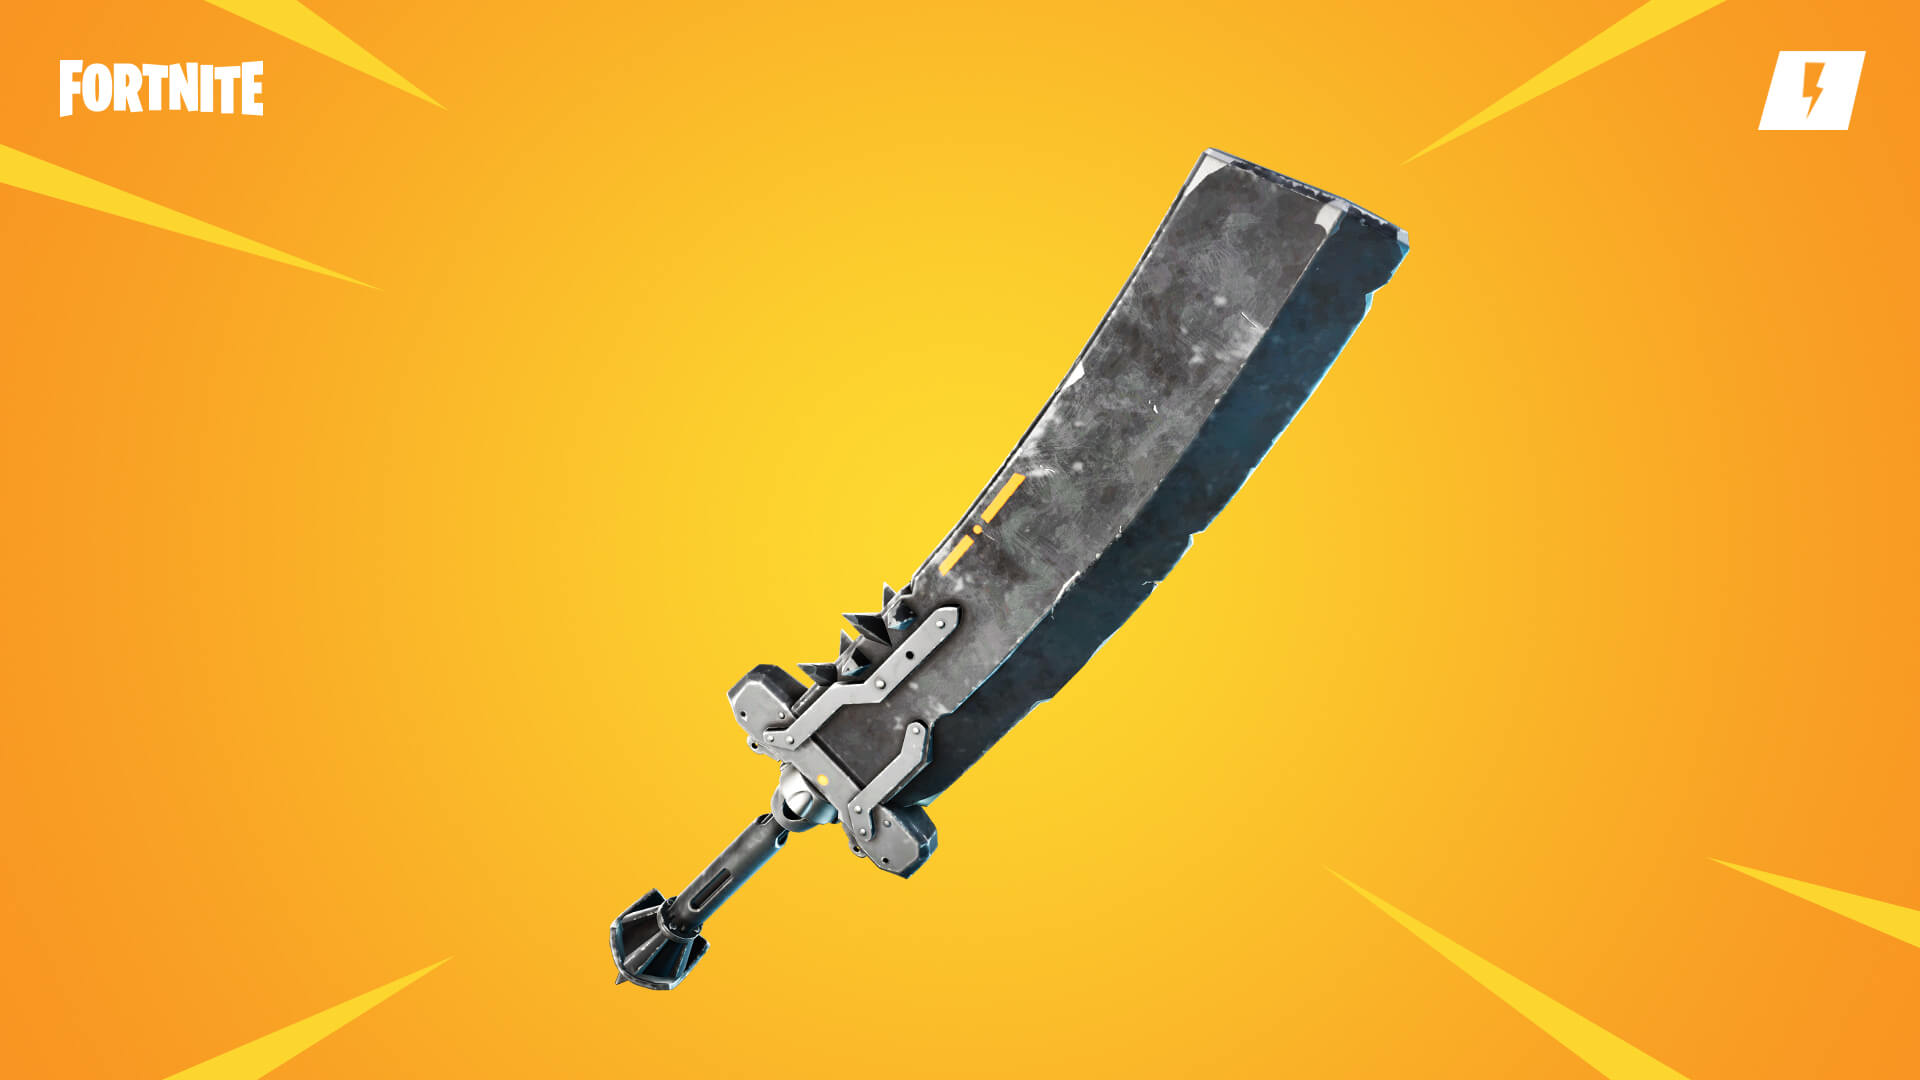 Fortnite Save The World Black Blade